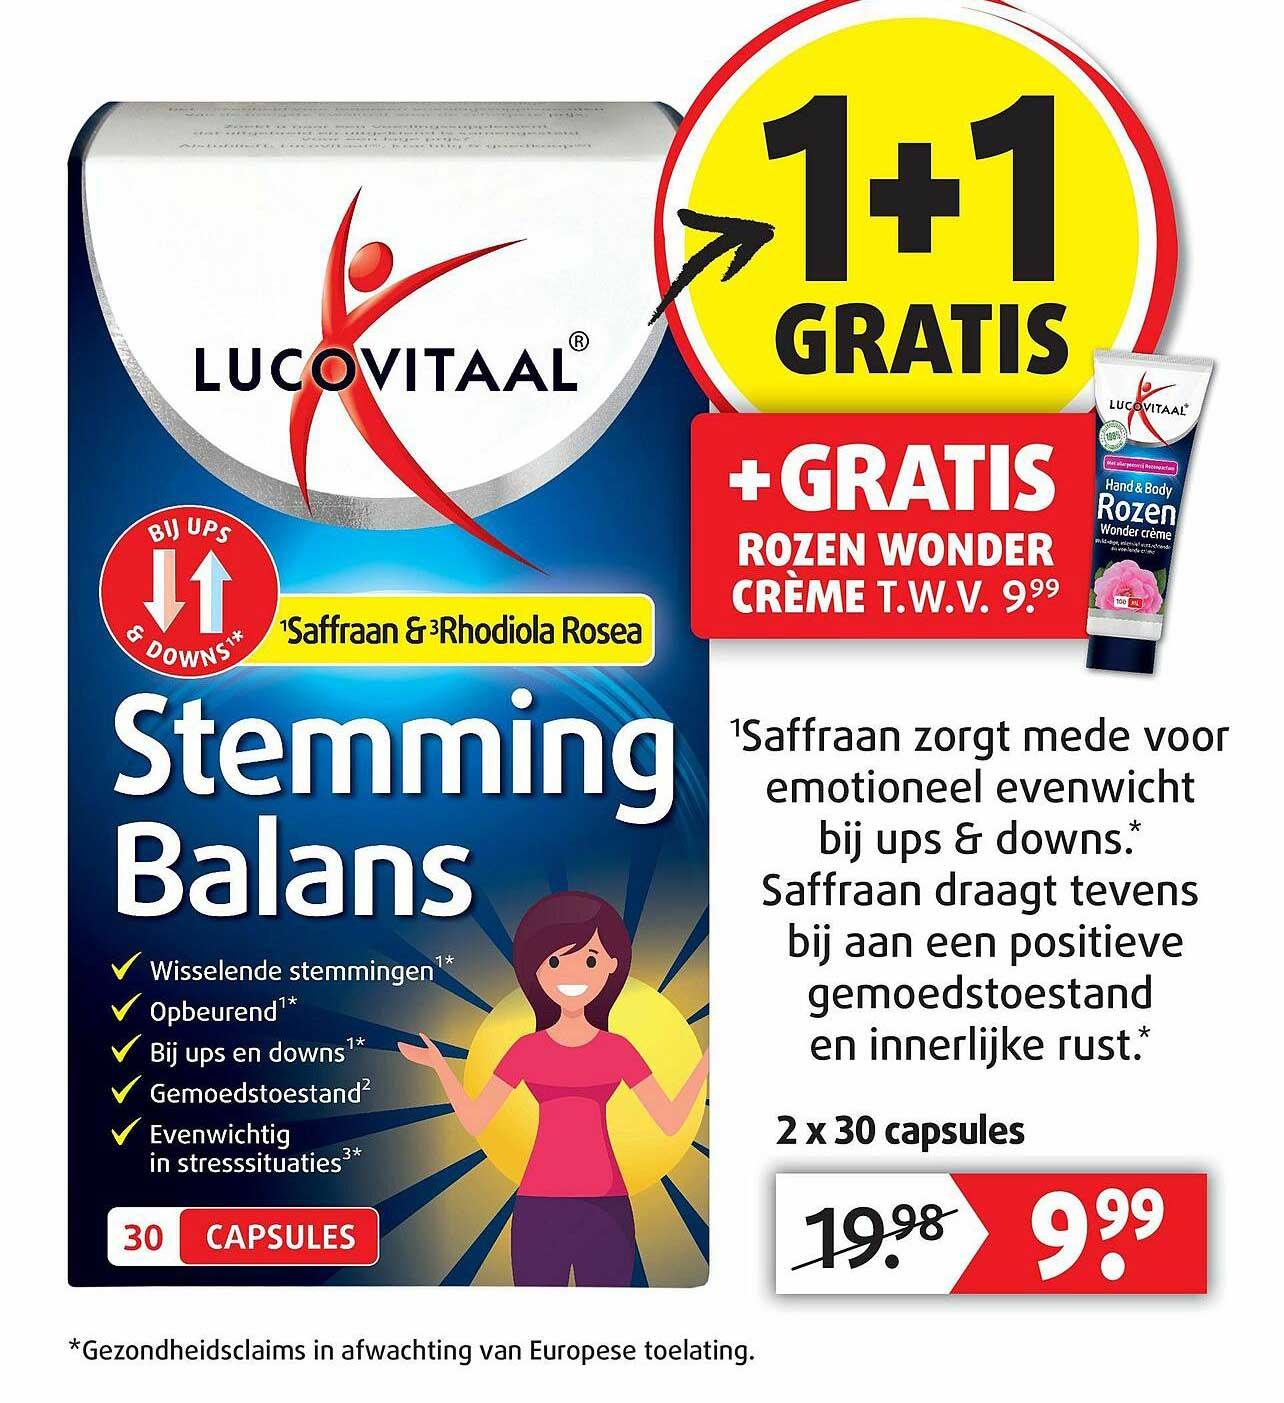 Lucovitaal Lucovitaal Stemming Balans 1+1 Gratis